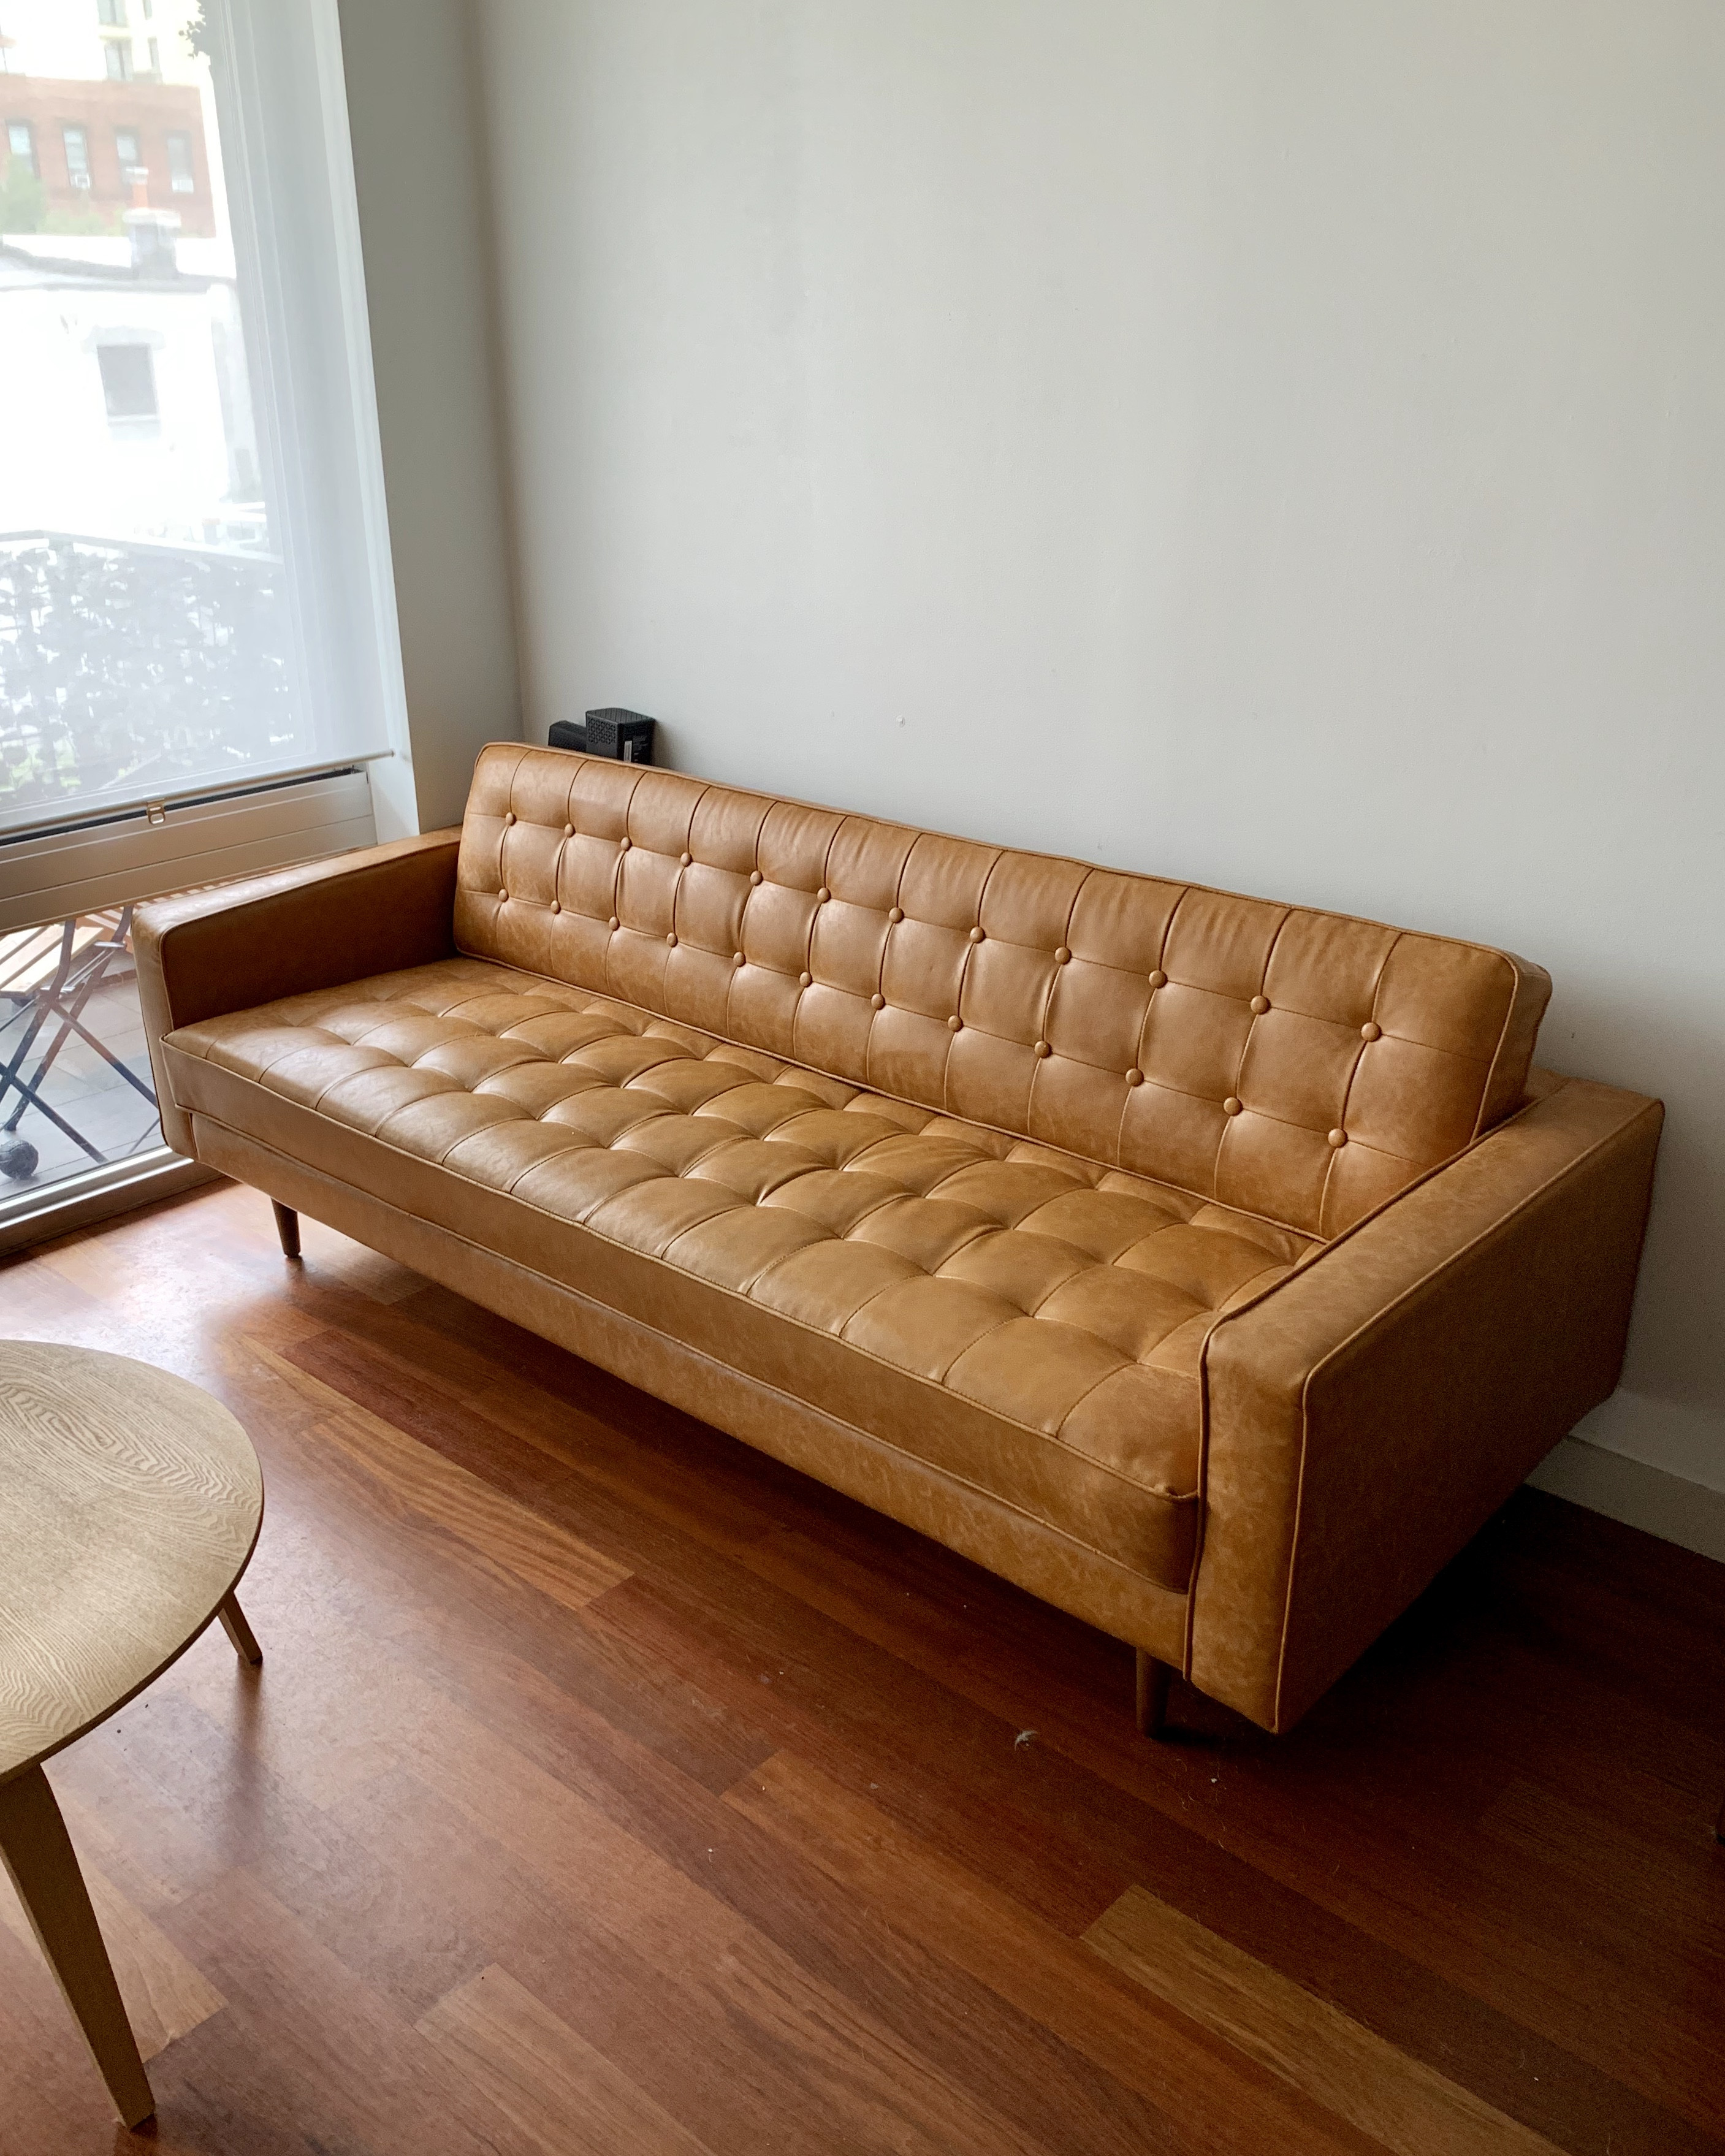 Modern Rustic Interiors Mid Century Vegan Leather Sofa   AptDeco